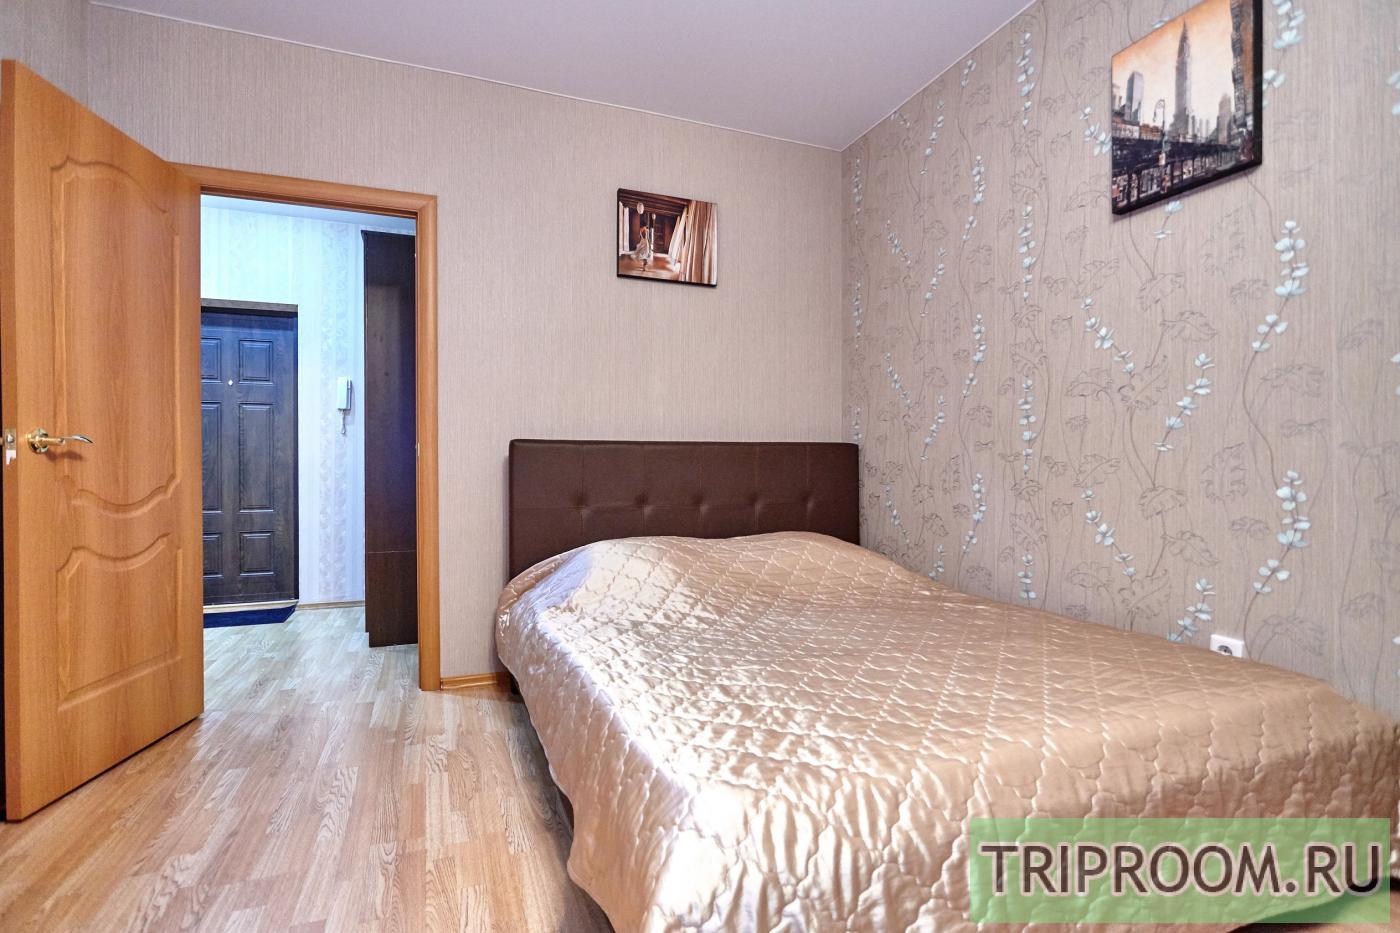 1-комнатная квартира посуточно (вариант № 6860), ул. Соколова улица, фото № 3